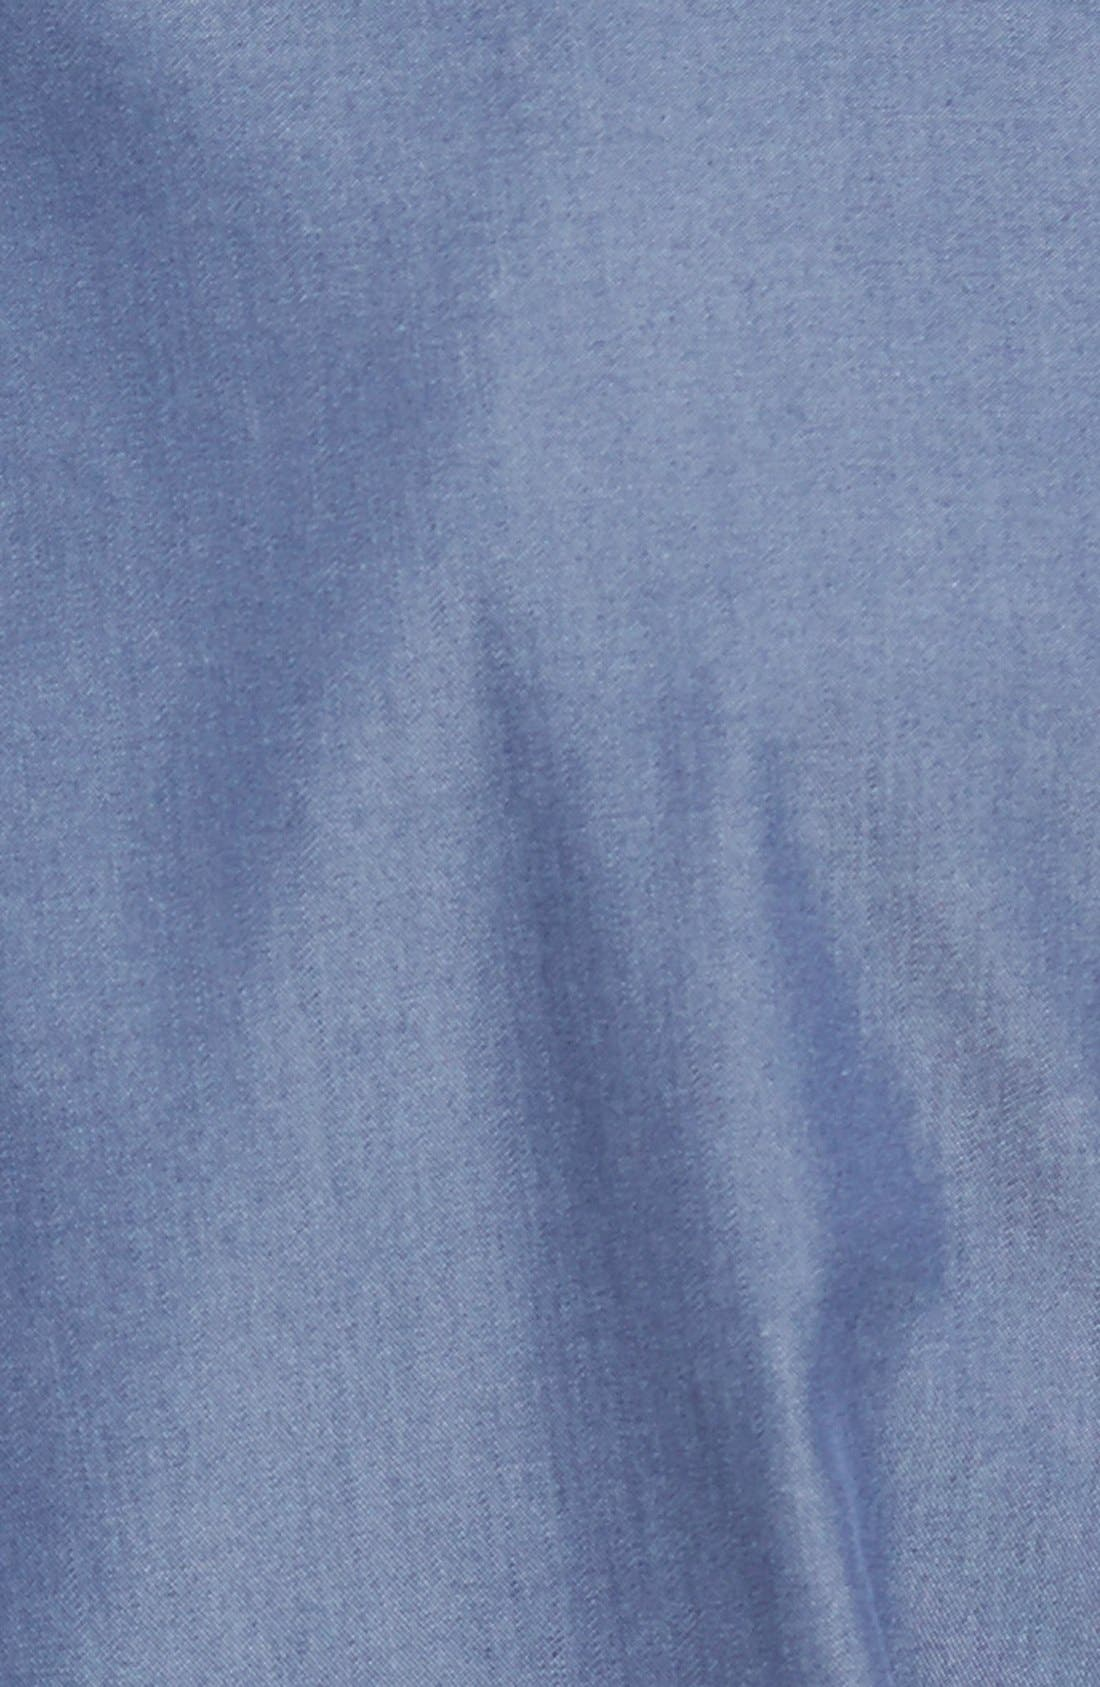 Alternate Image 3  - Nordstrom Men's Shop Smartcare™ Regular Fit Twill Denim Boat Shirt (Regular & Tall)